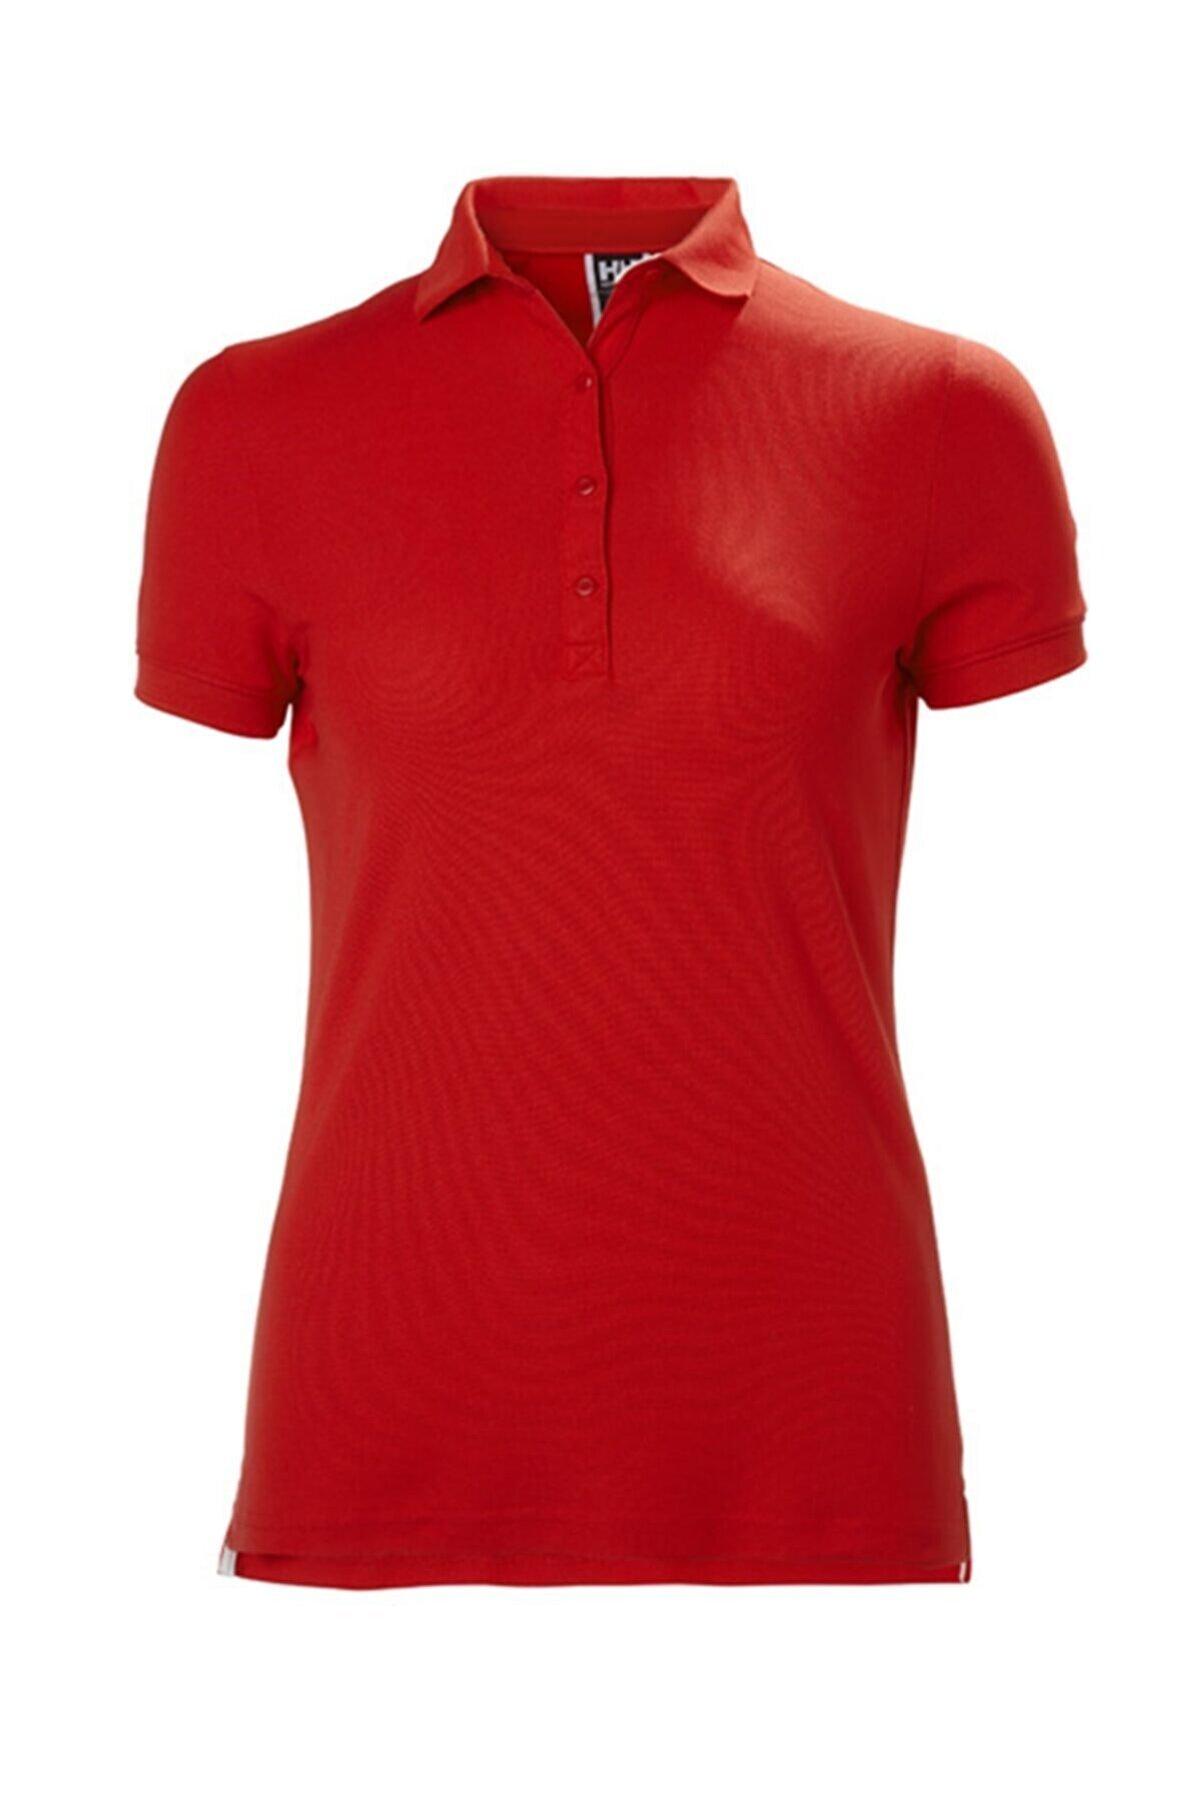 Helly Hansen Kadın Kırmızı T-Shirt